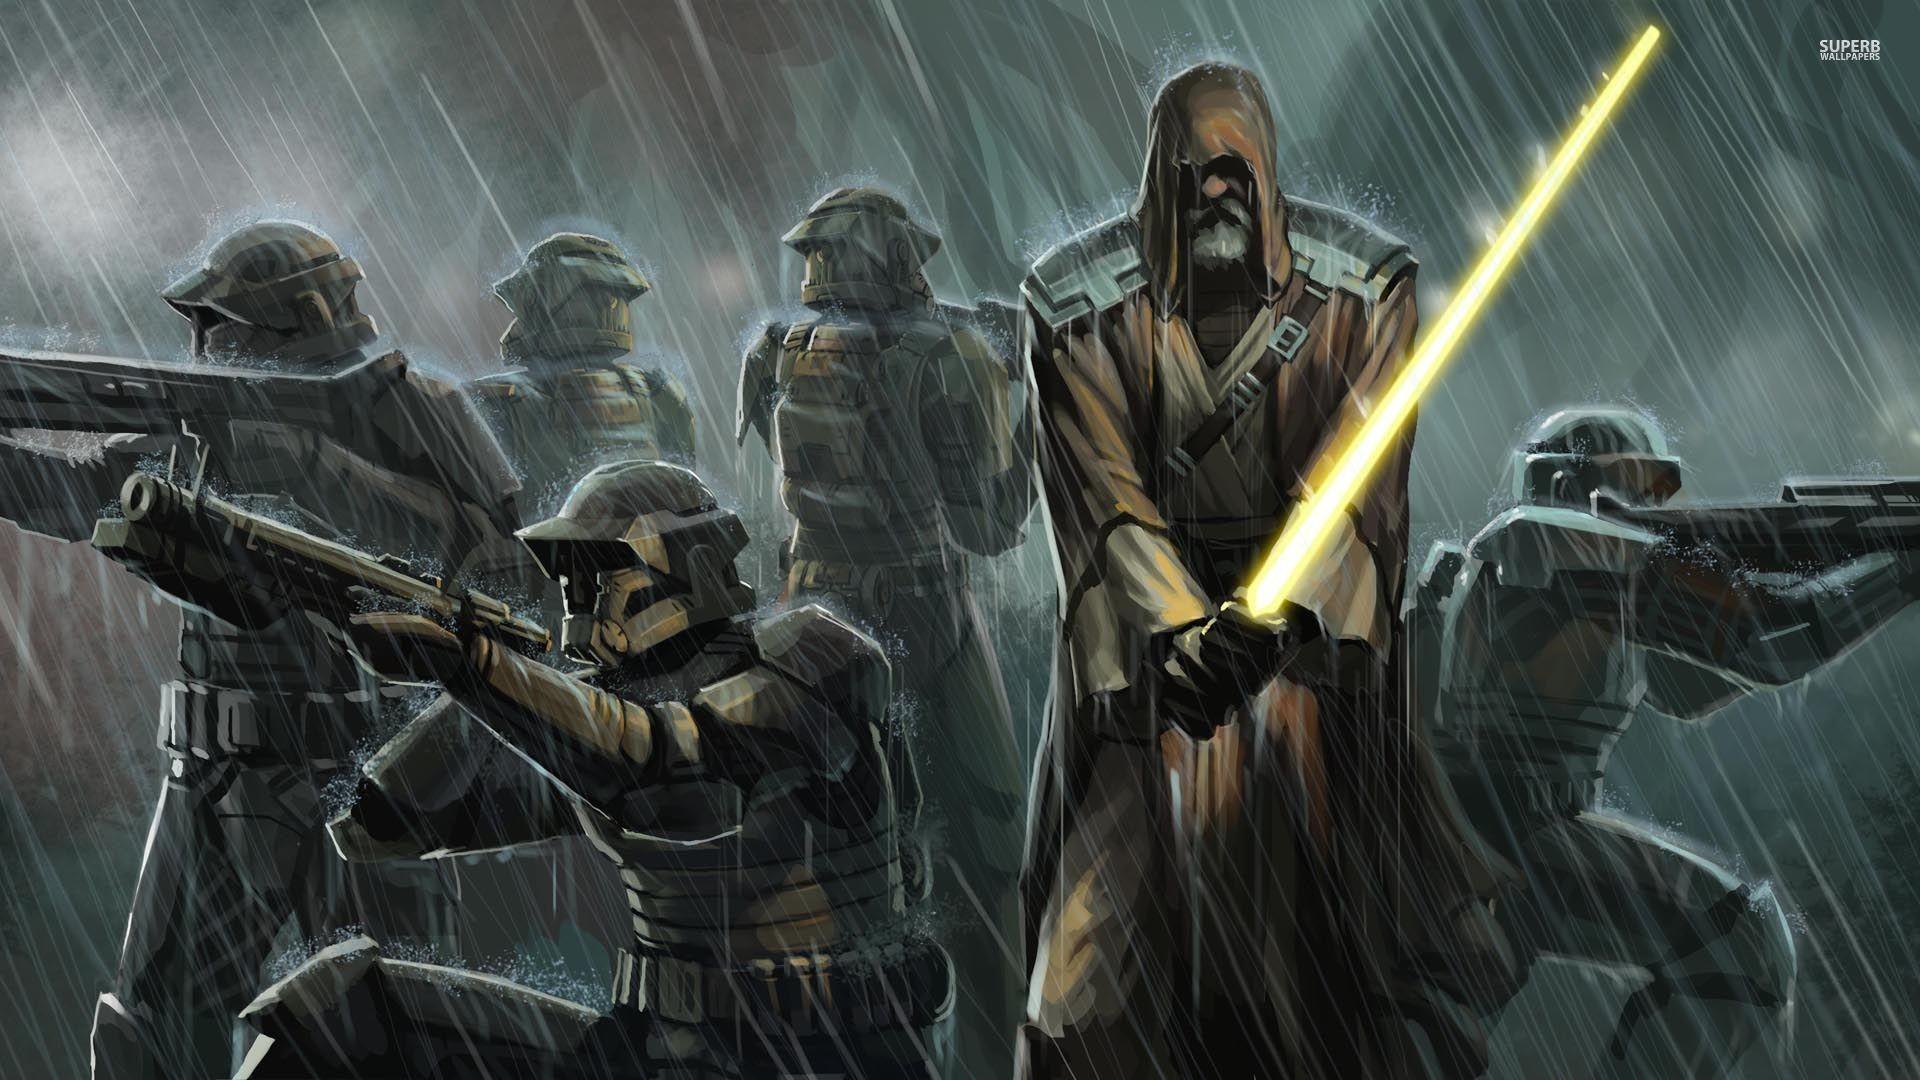 Star Wars Mandalorian Wallpaper Posted By Sarah Mercado